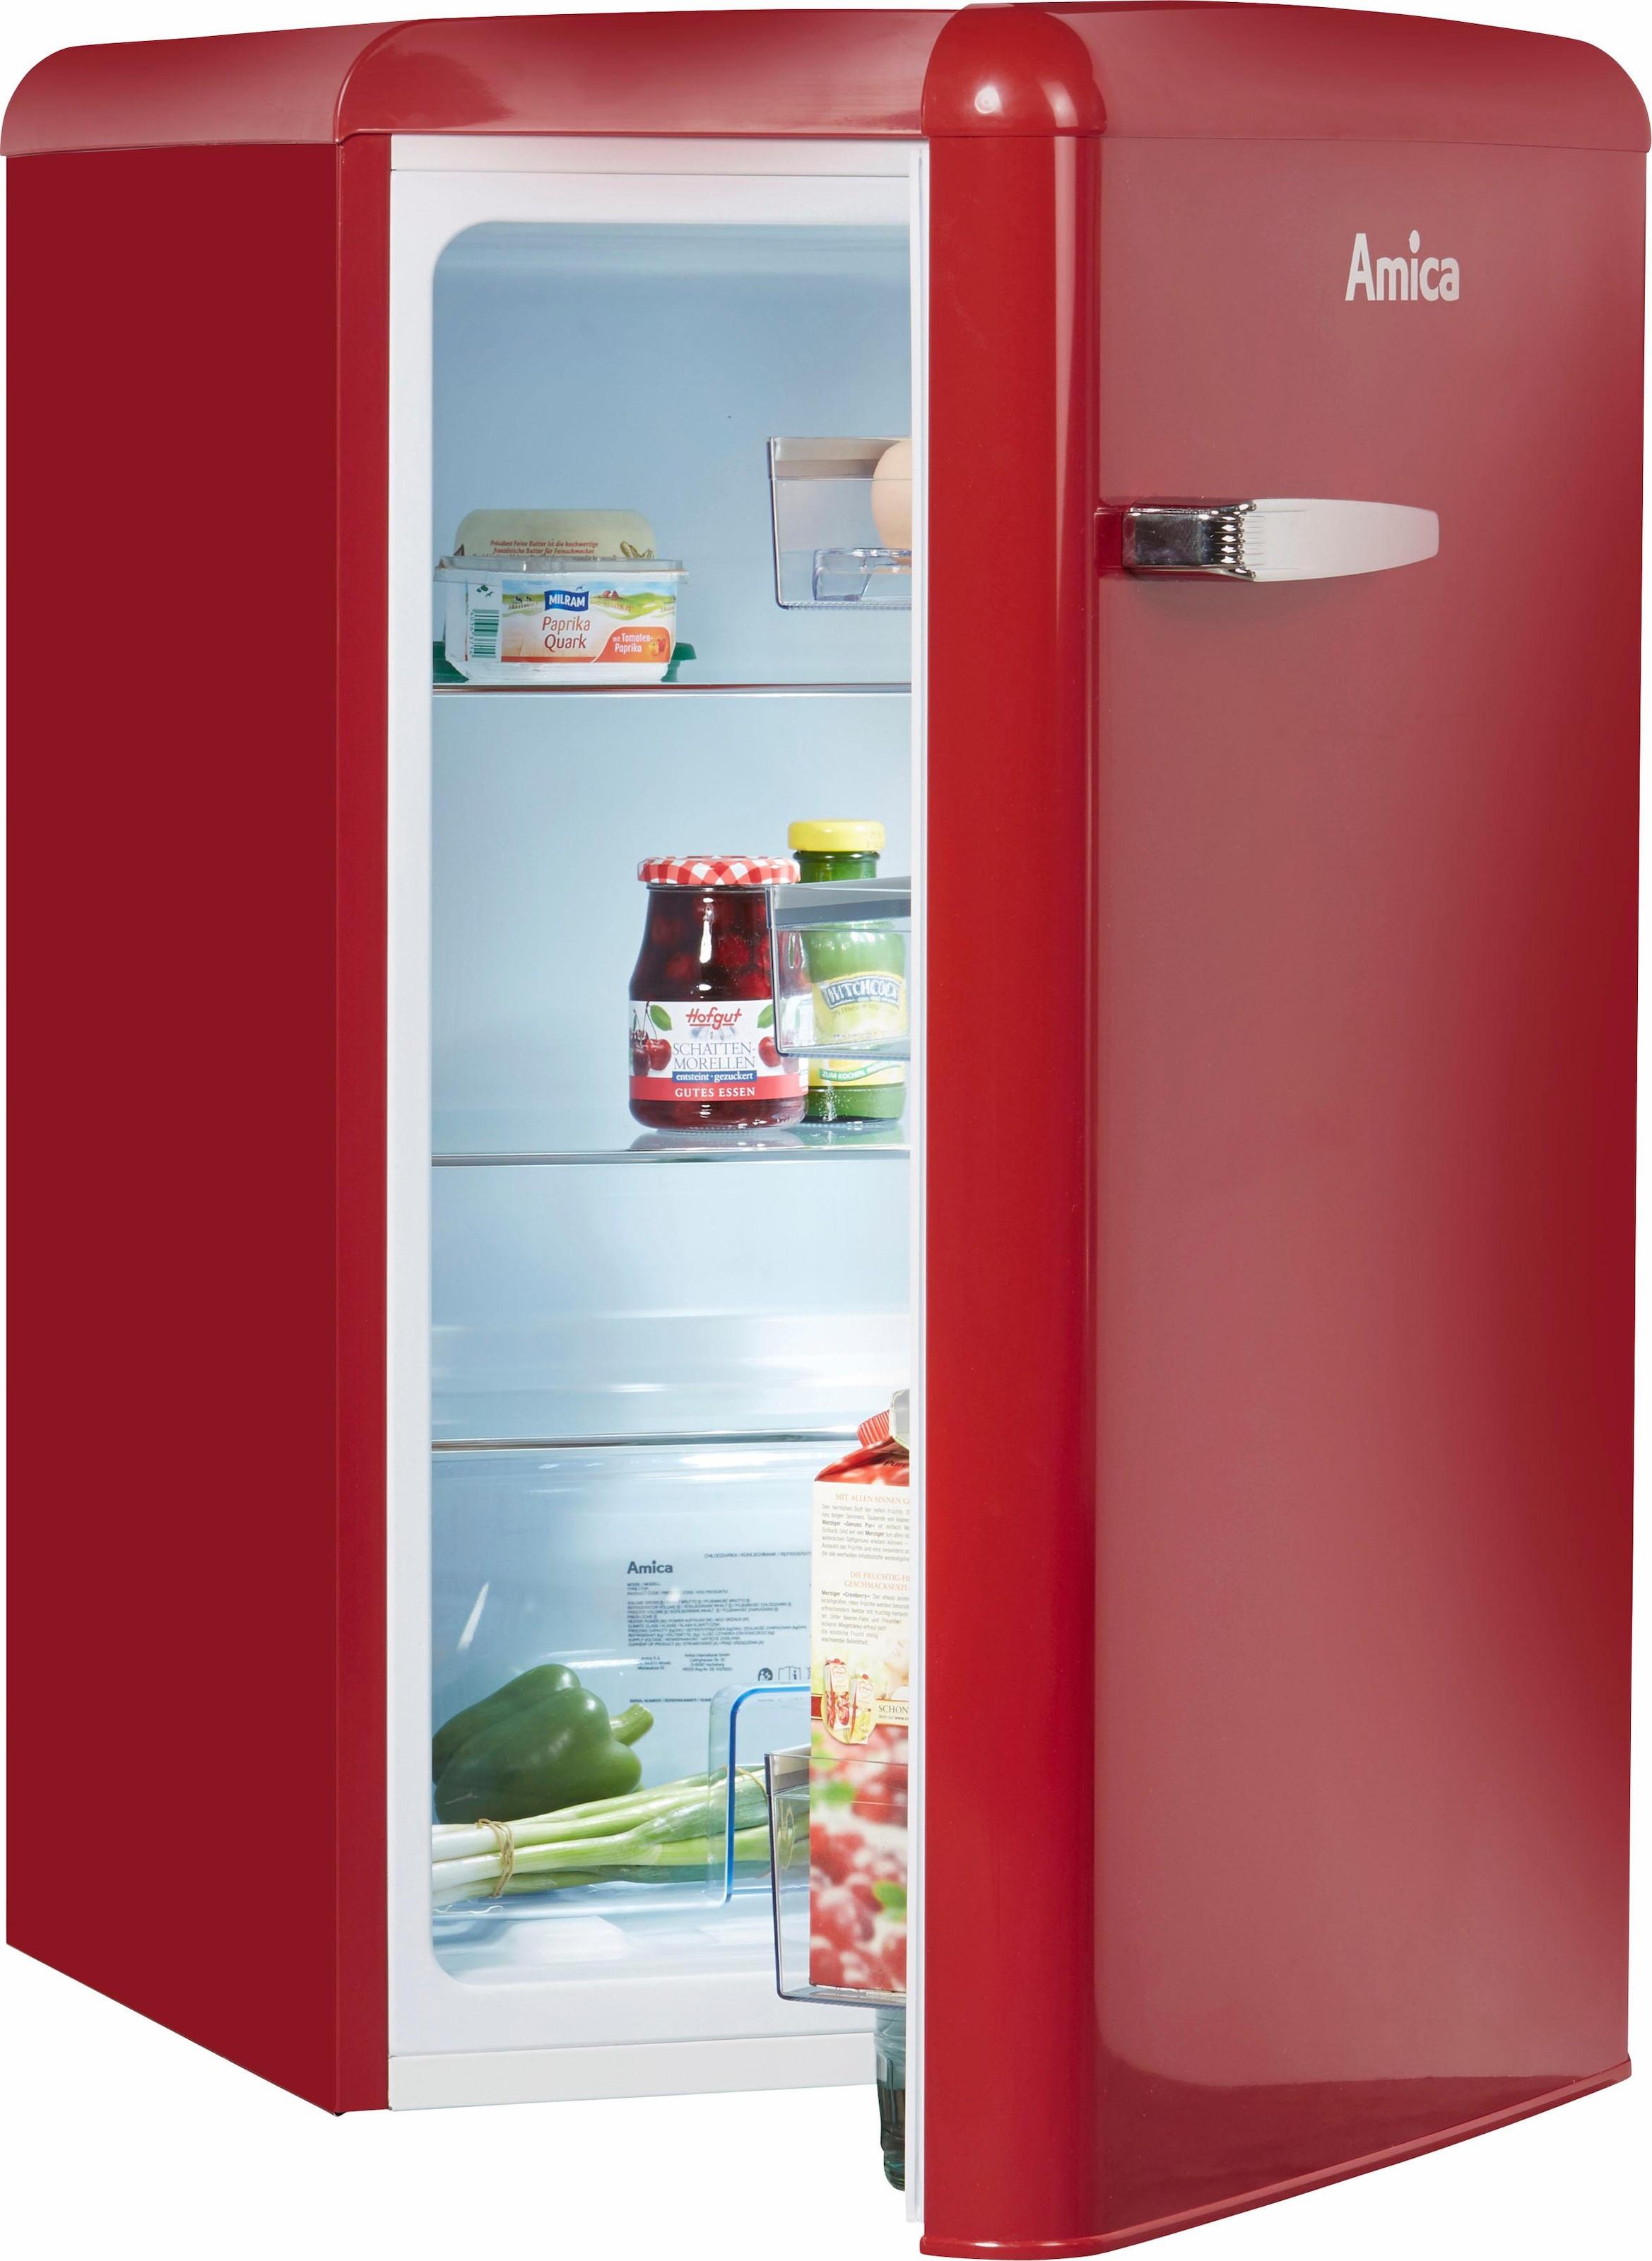 Amica Kühlschrank Vks : Amica vollraumkühlschrank vks r cm hoch bestellen baur